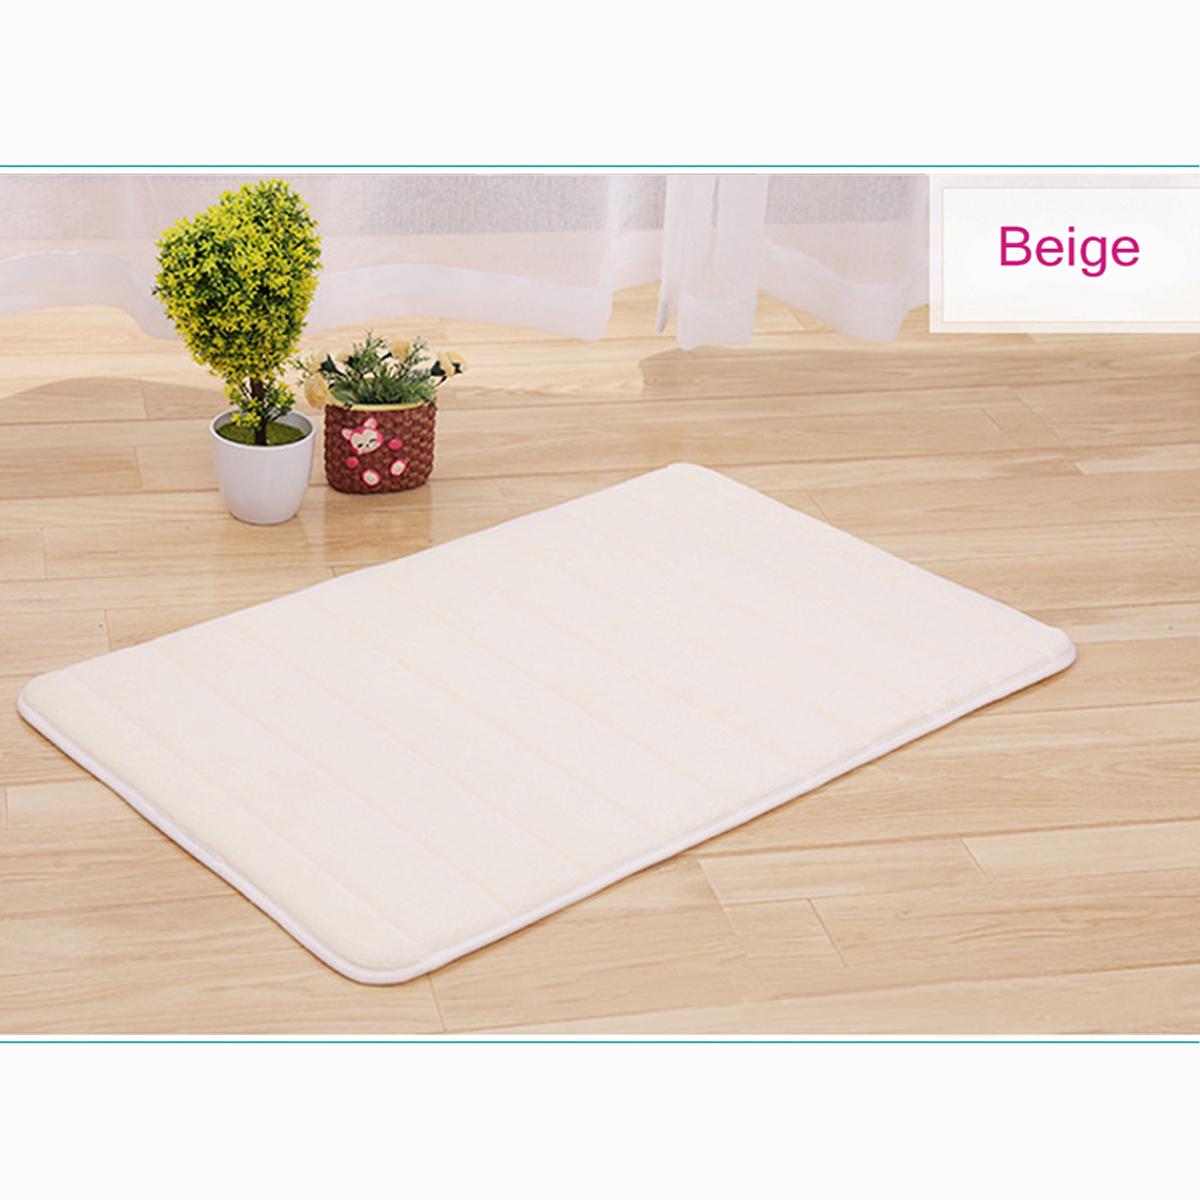 Details about Non-slip Absorbent Floor Carpet Soft Memory Foam Mat Kitchen  Bathroom Rug Carpet